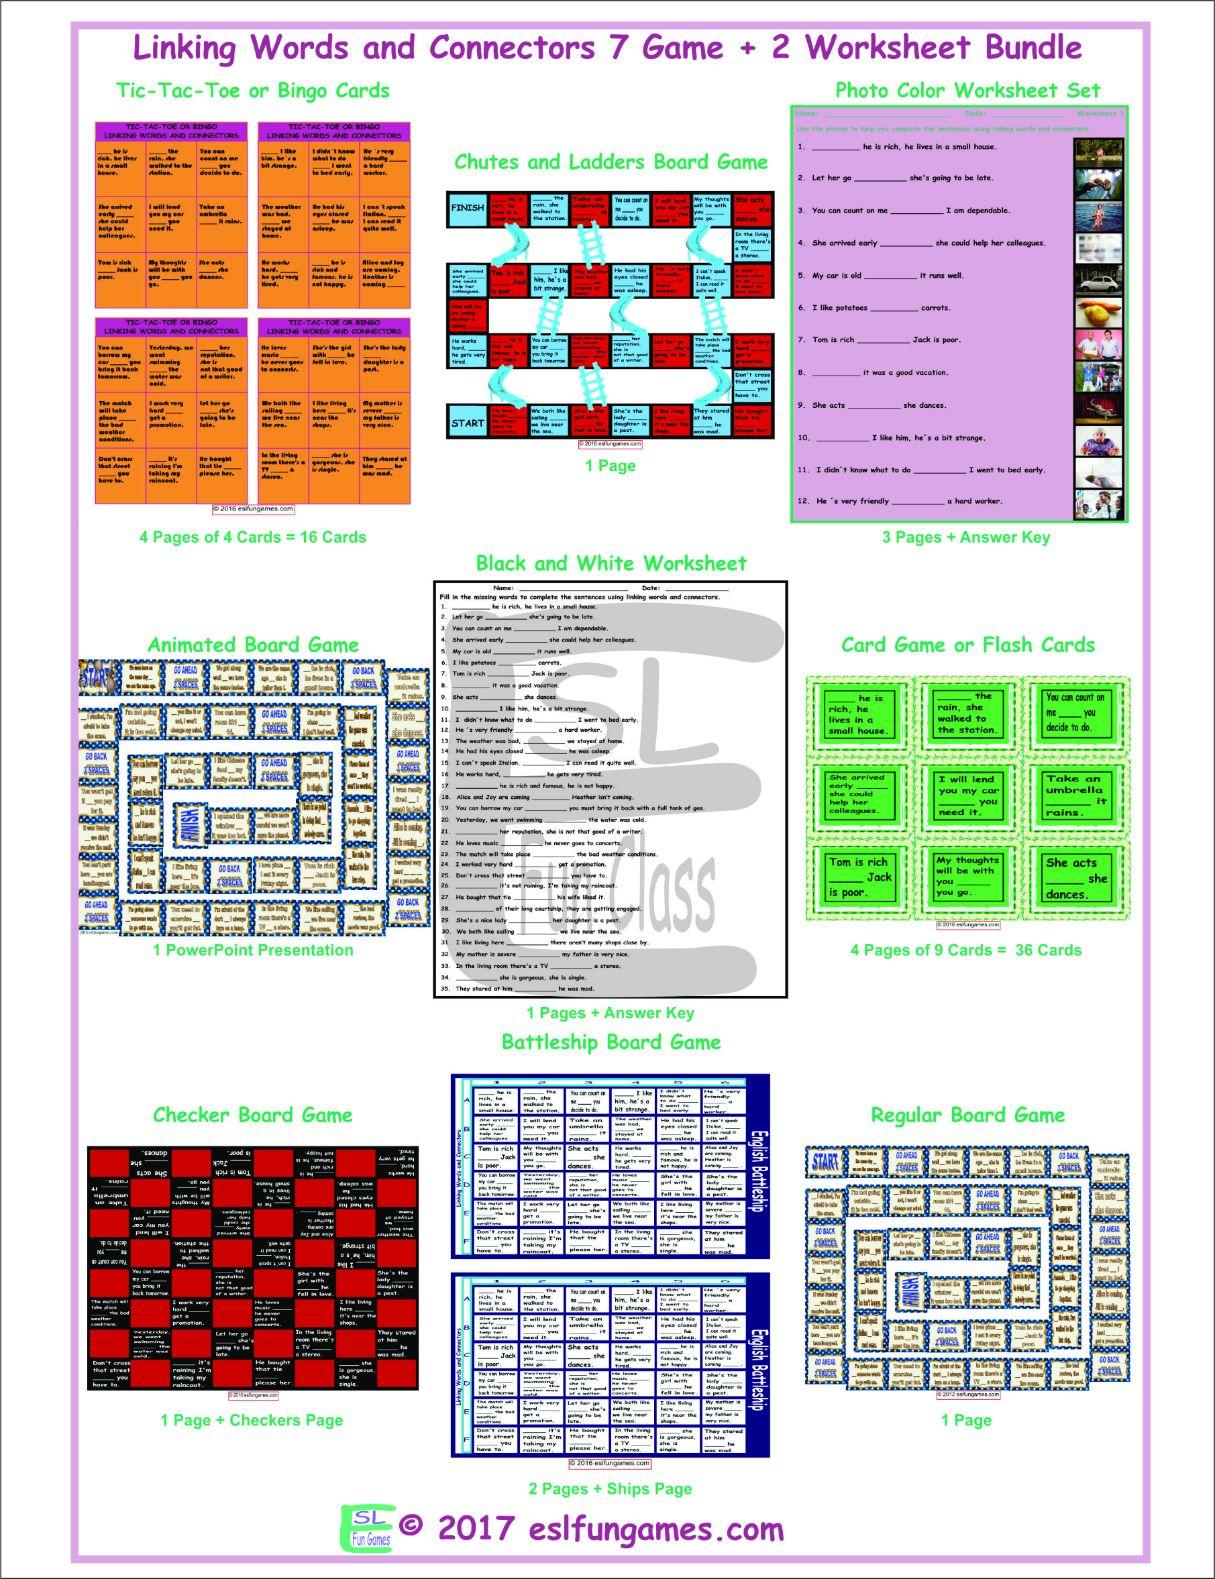 Linking Words And Connectors 7 Game Plus 2 Worksheet Bundle By Eslfungames